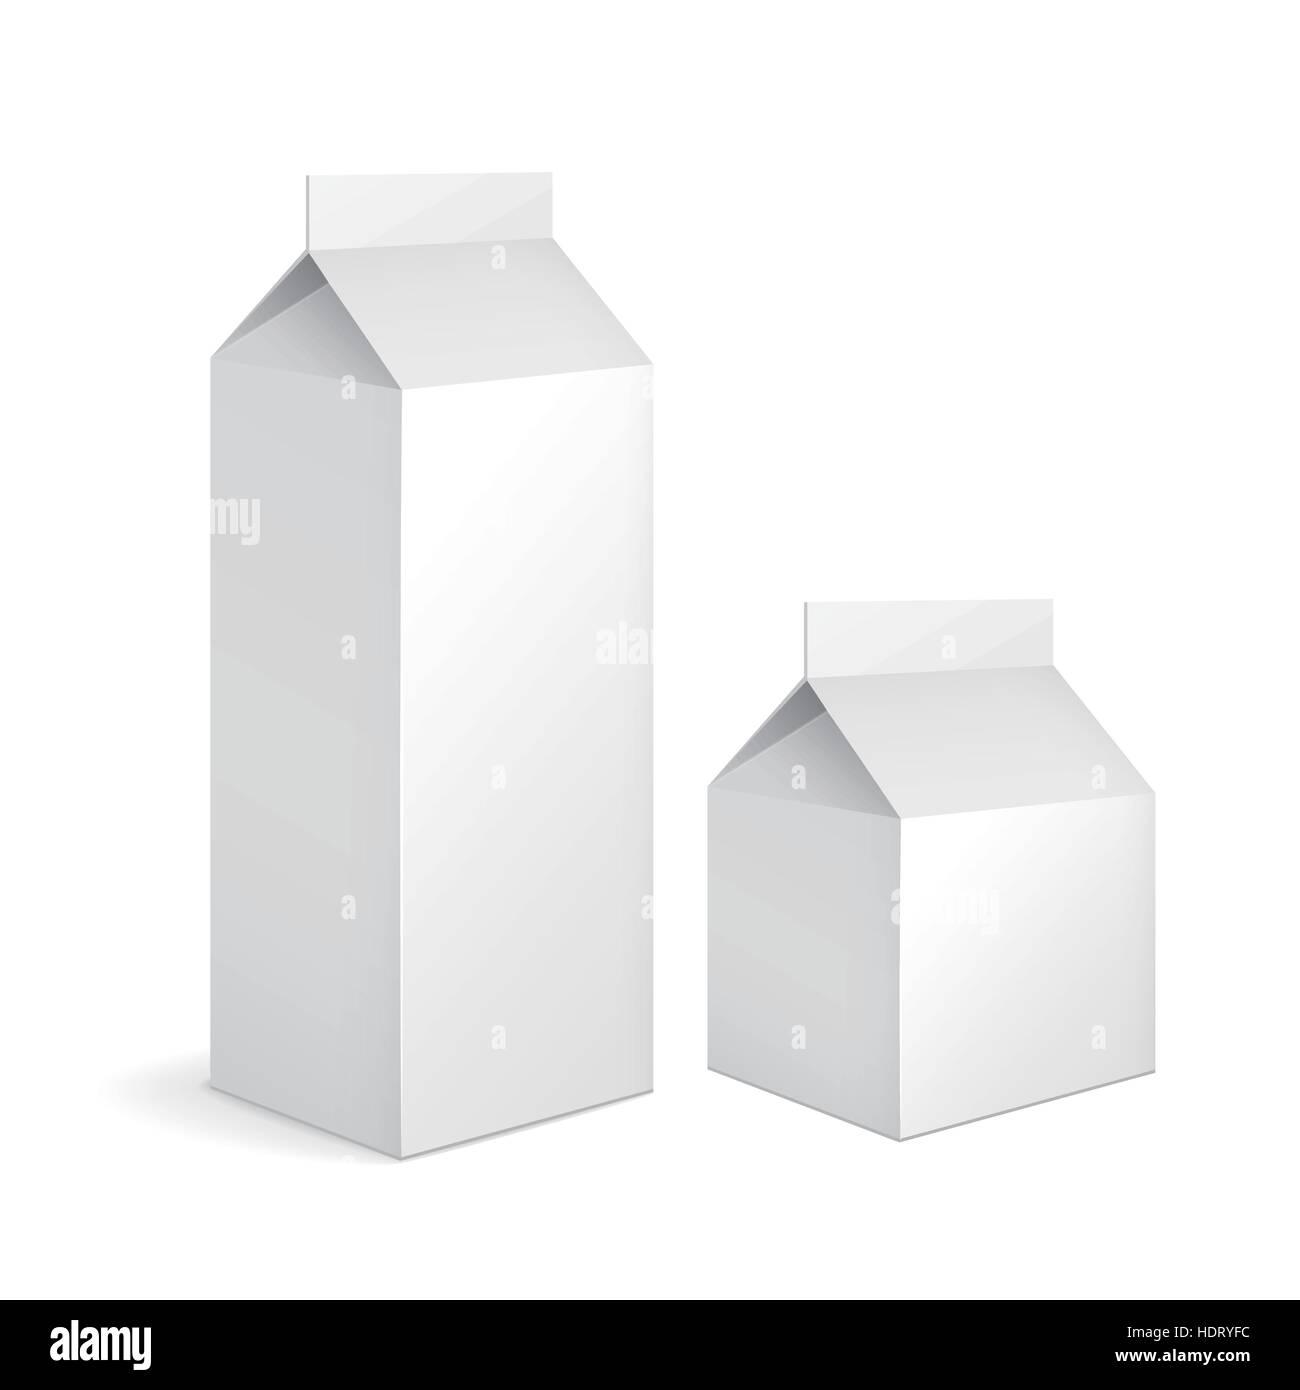 Milk Carton Stock Vector Images - Alamy